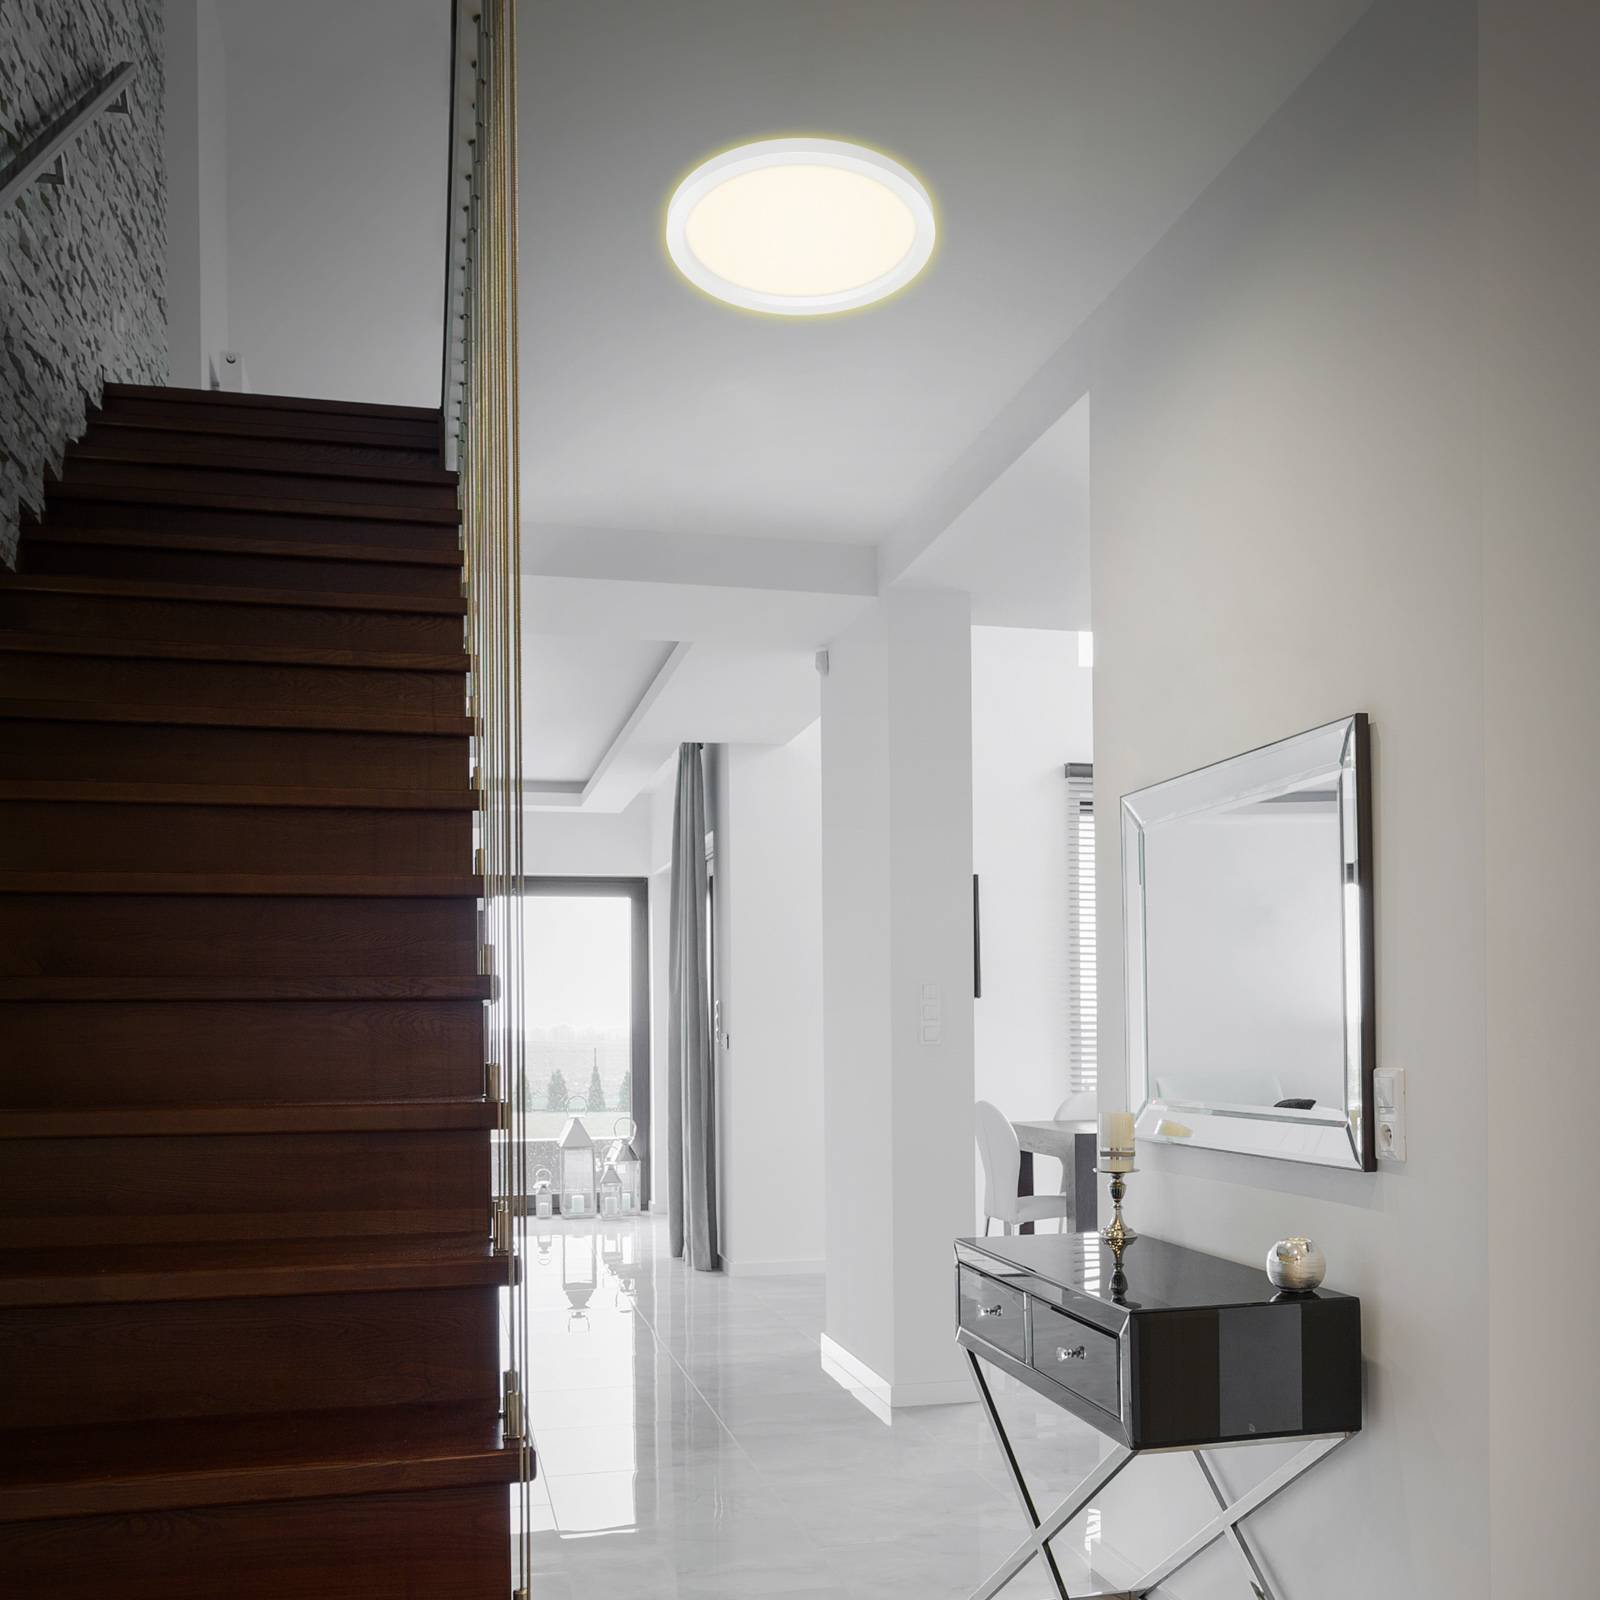 LED-taklampe 7361, Ø 29 cm hvit